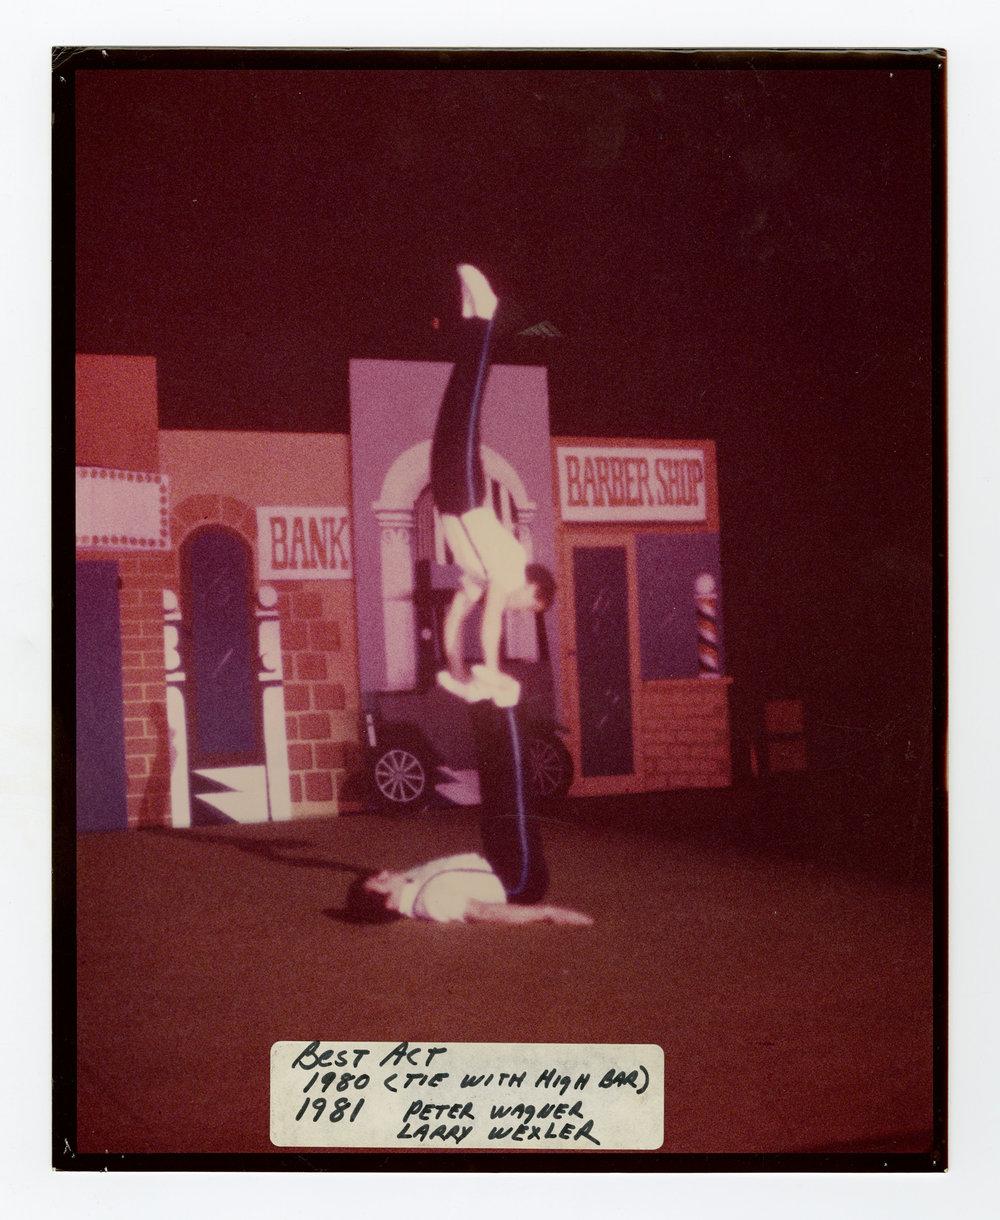 1980 & 1981 - Men's Doubles Balancing